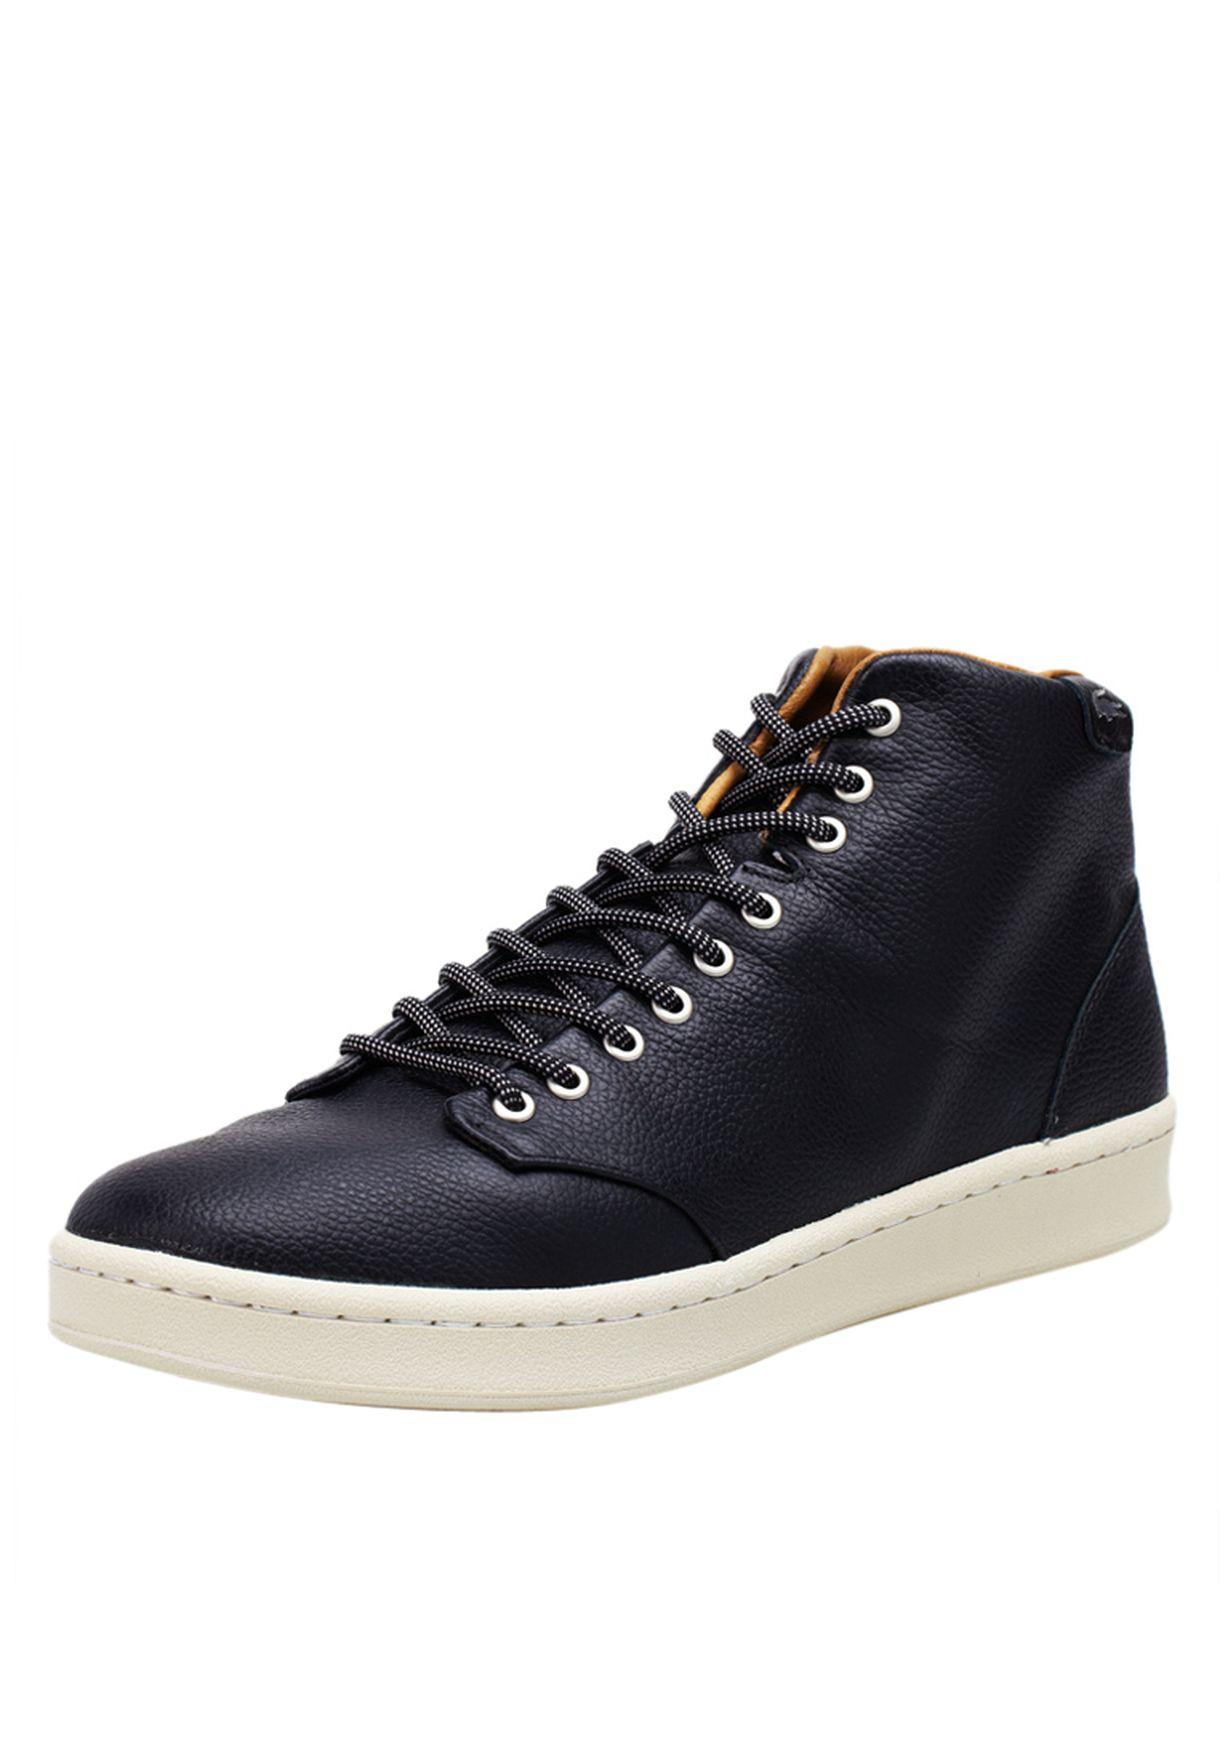 67e97480f Shop Lacoste black Heldon Hightop Sneakers 24STM4004-024 for Men in ...